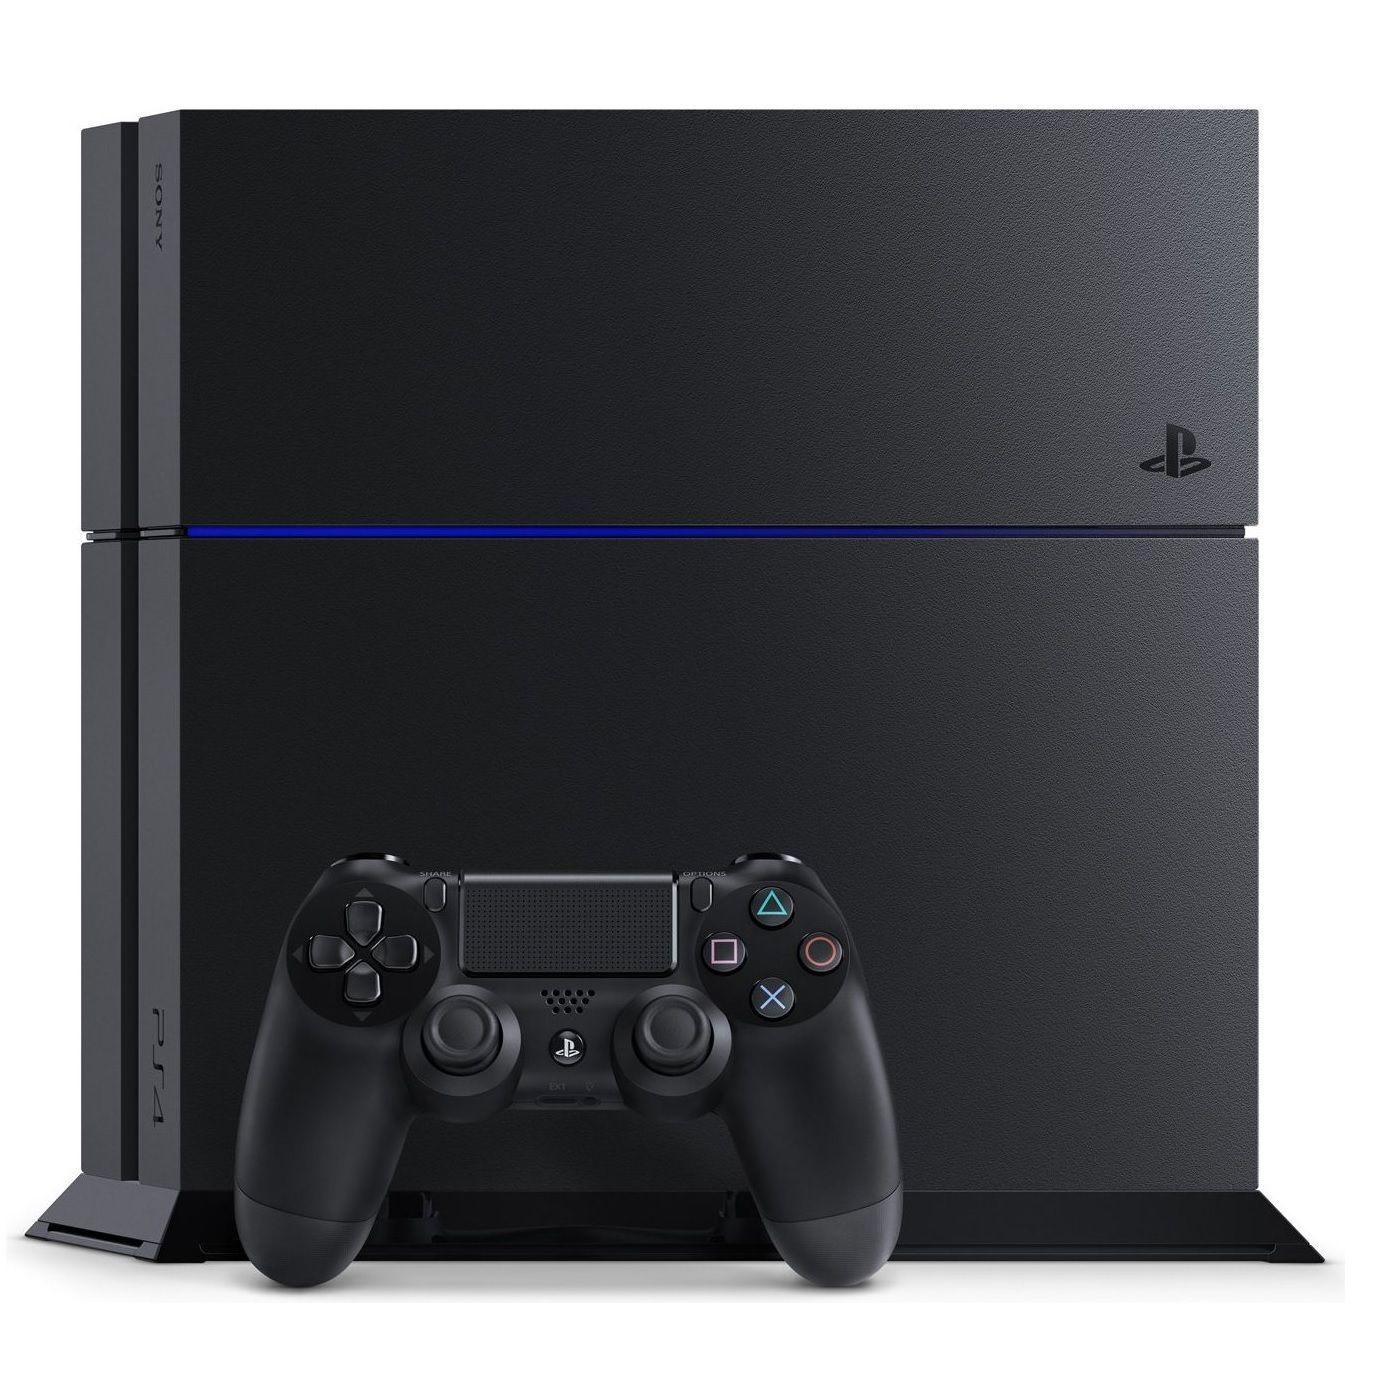 dfe61c9d533e8 New Sony PlayStation 4 PS4 500GB Original Matte Black Console CUH ...